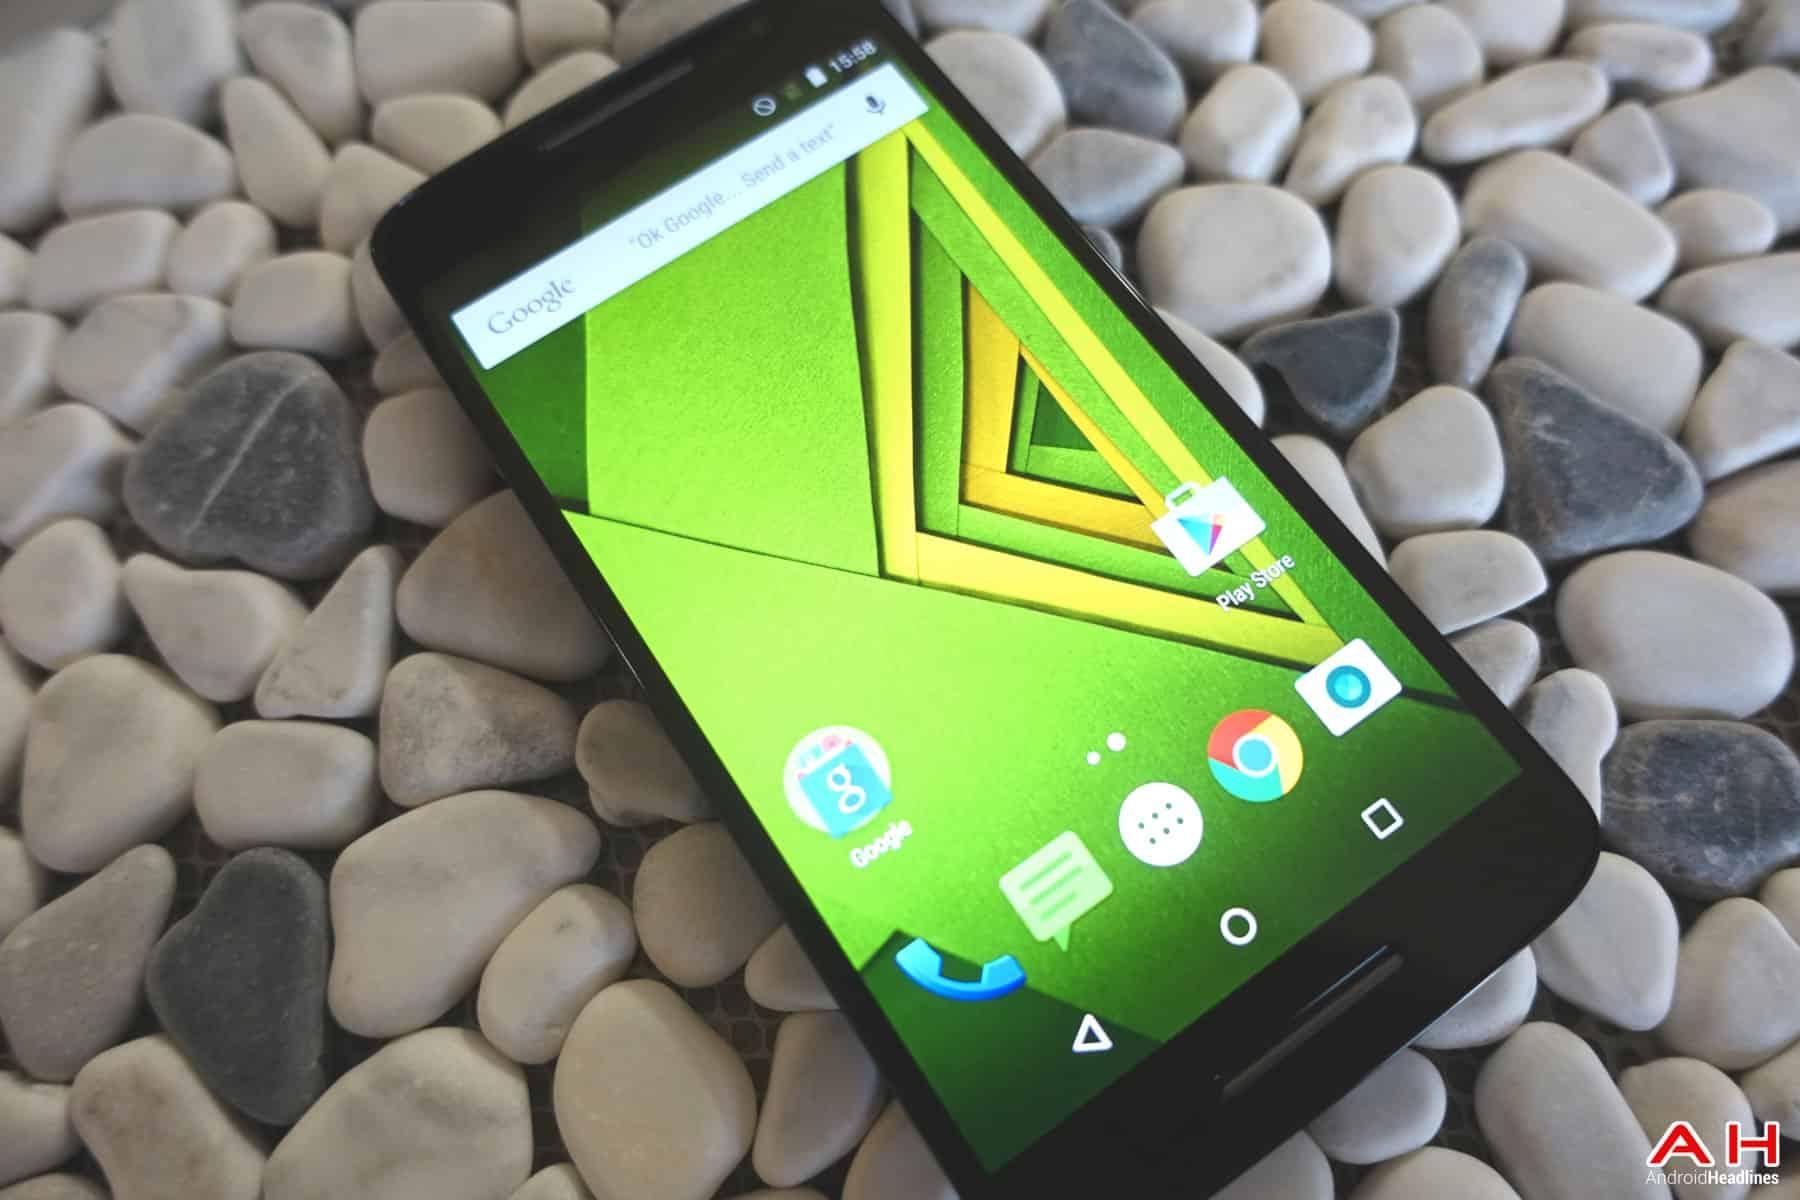 AH Motorola Moto X Play 0 -4